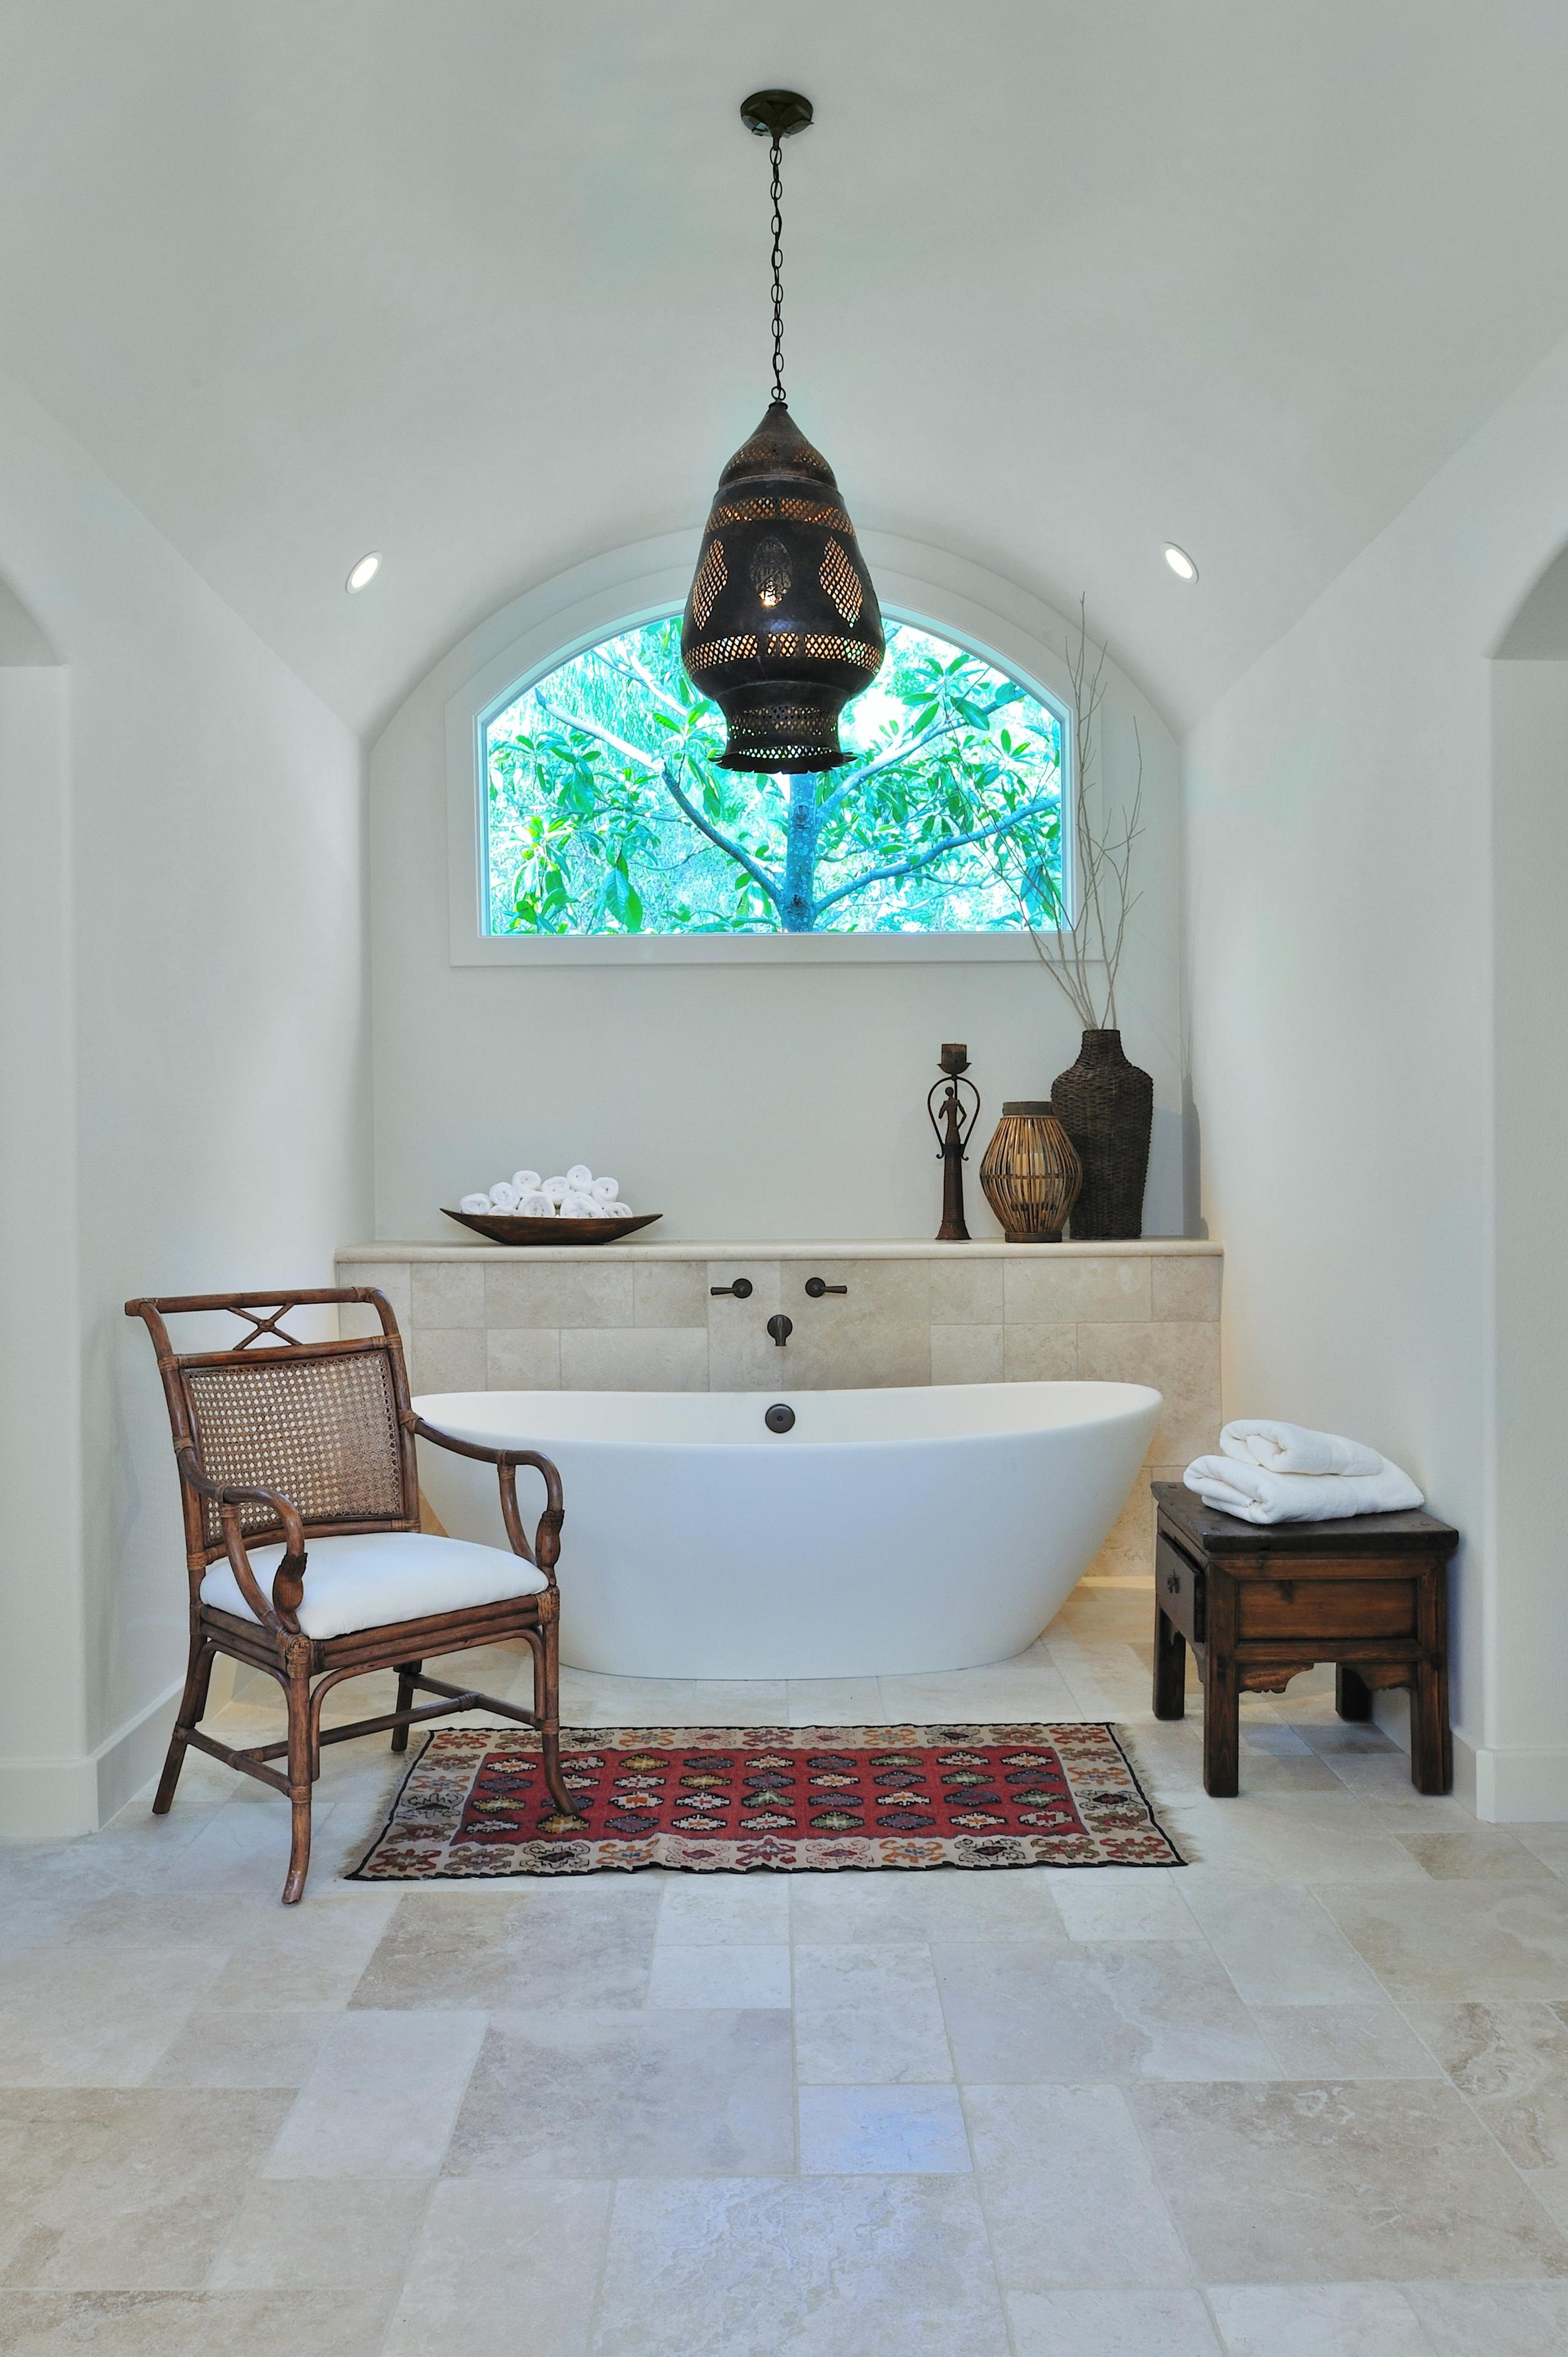 Master Bath Remodel with free-standing tub, Designer: Carla Aston